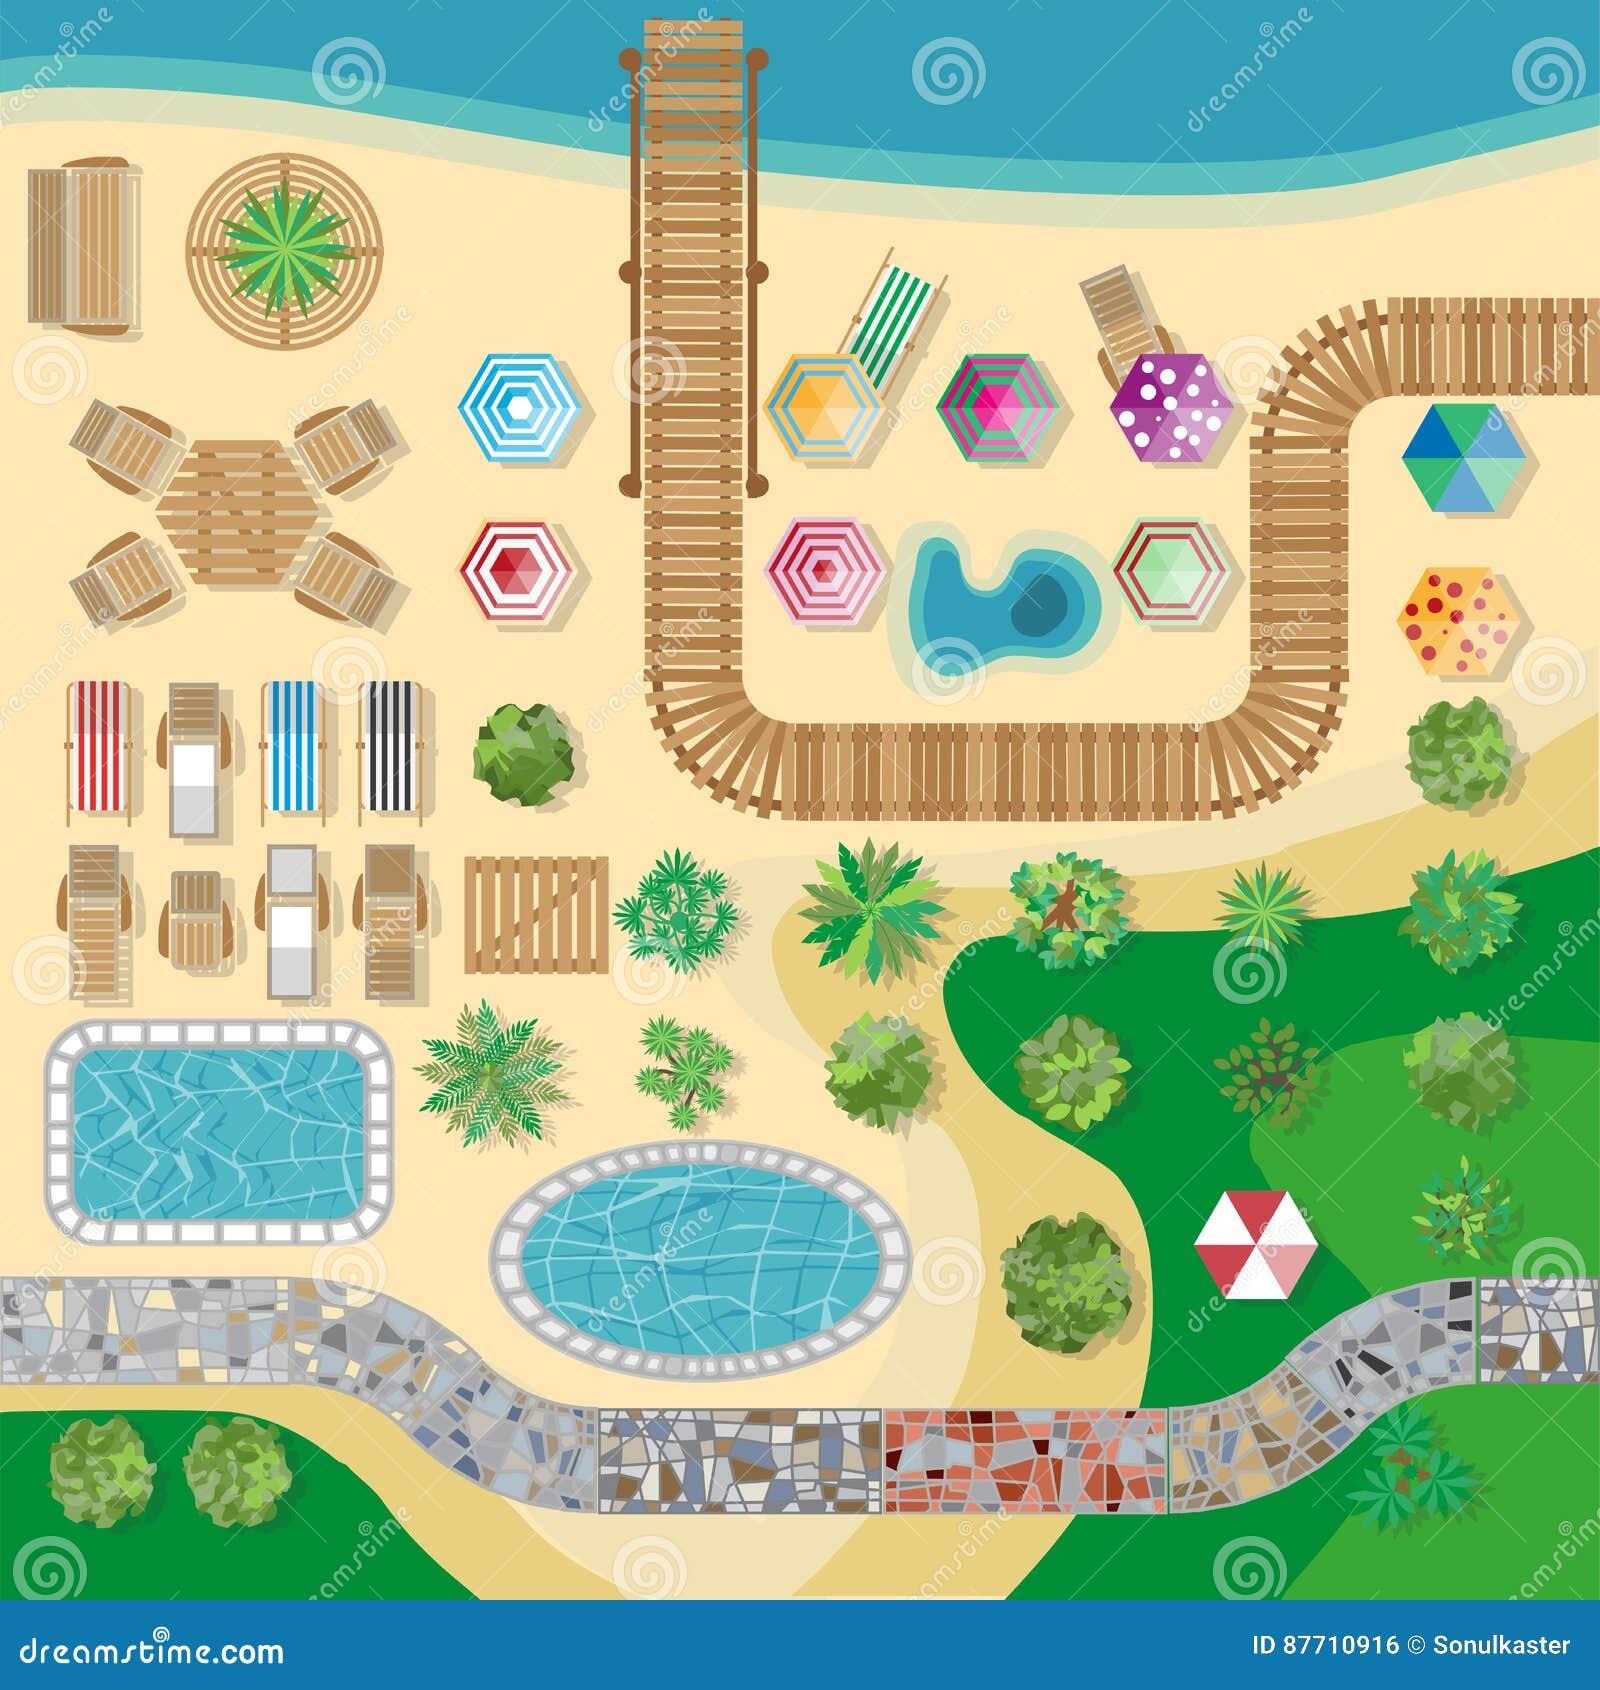 Swimming Pool Hotel Resort Vector Layout Template Stock Vector Illustration Of Resort Design 87710916